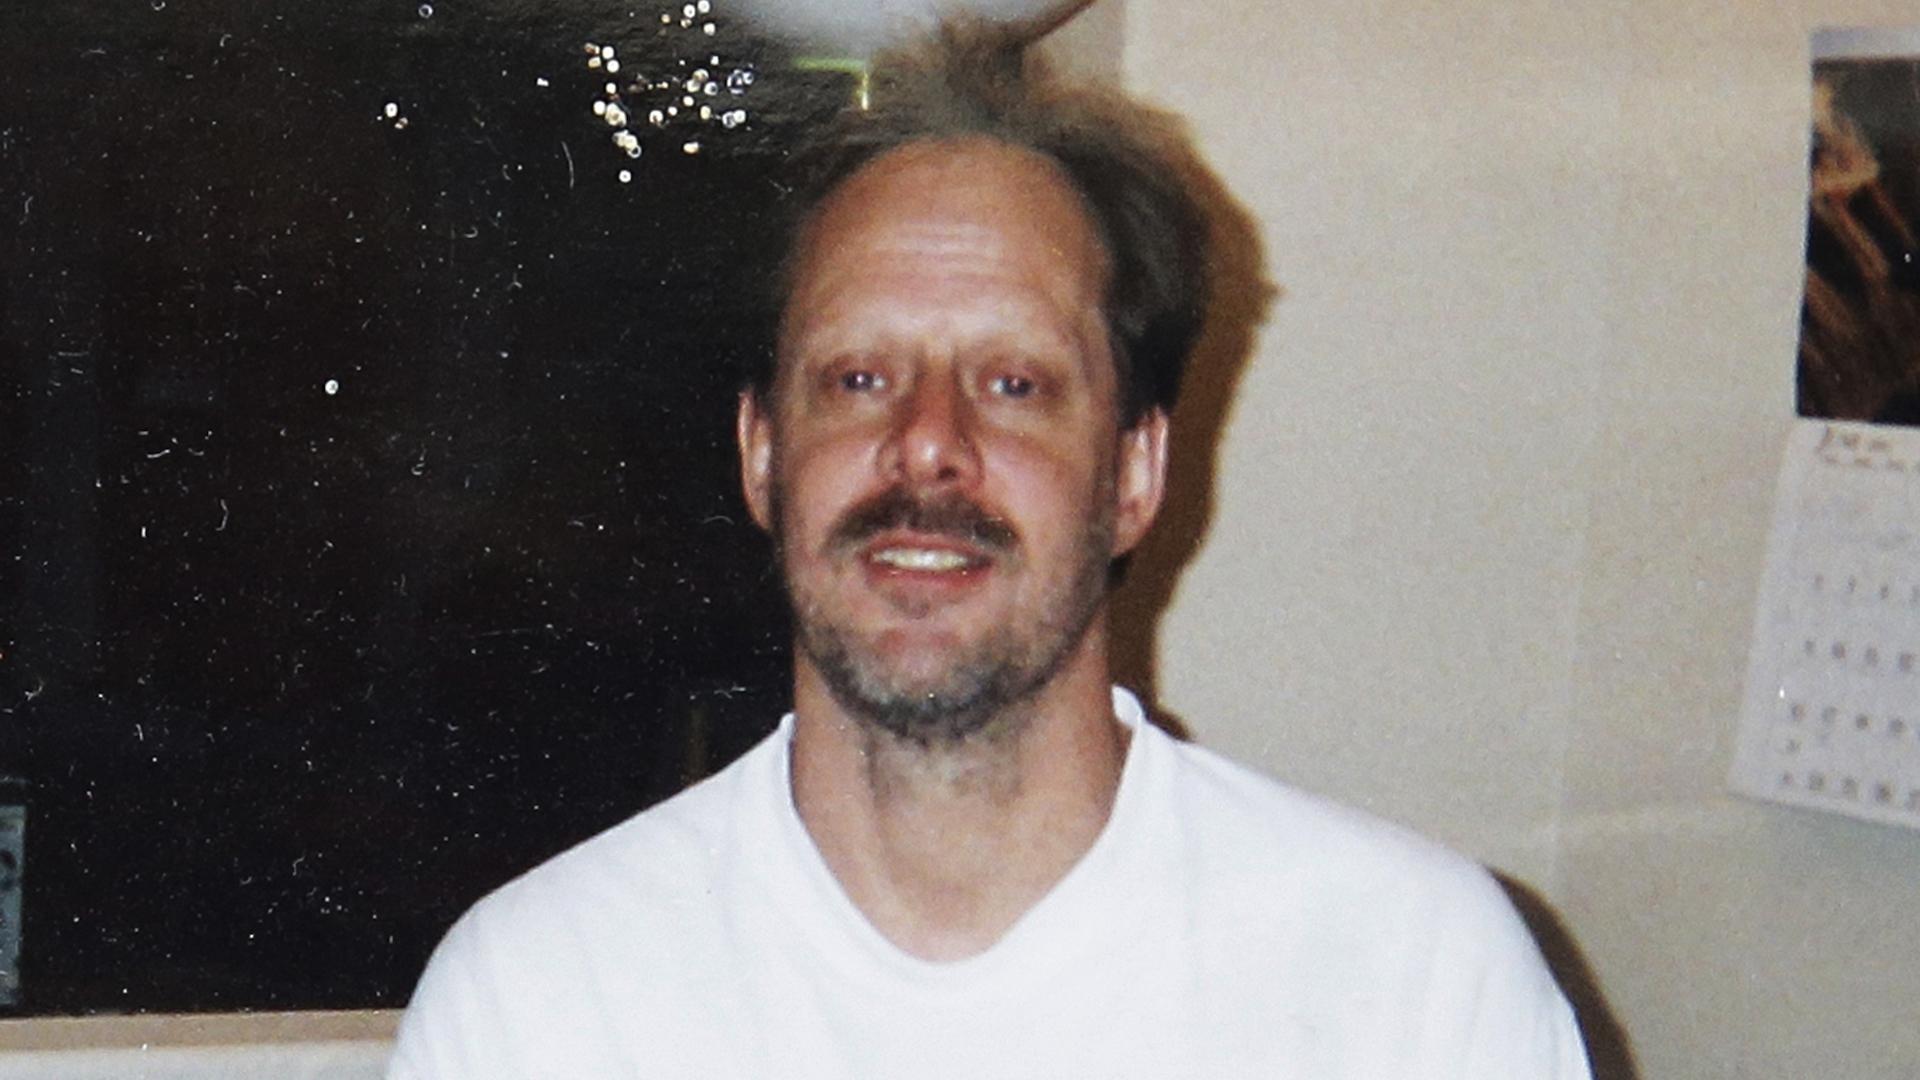 Las Vegas gunman Stephen Paddock was a high-stakes gambler who 'kept to himself' before massacre